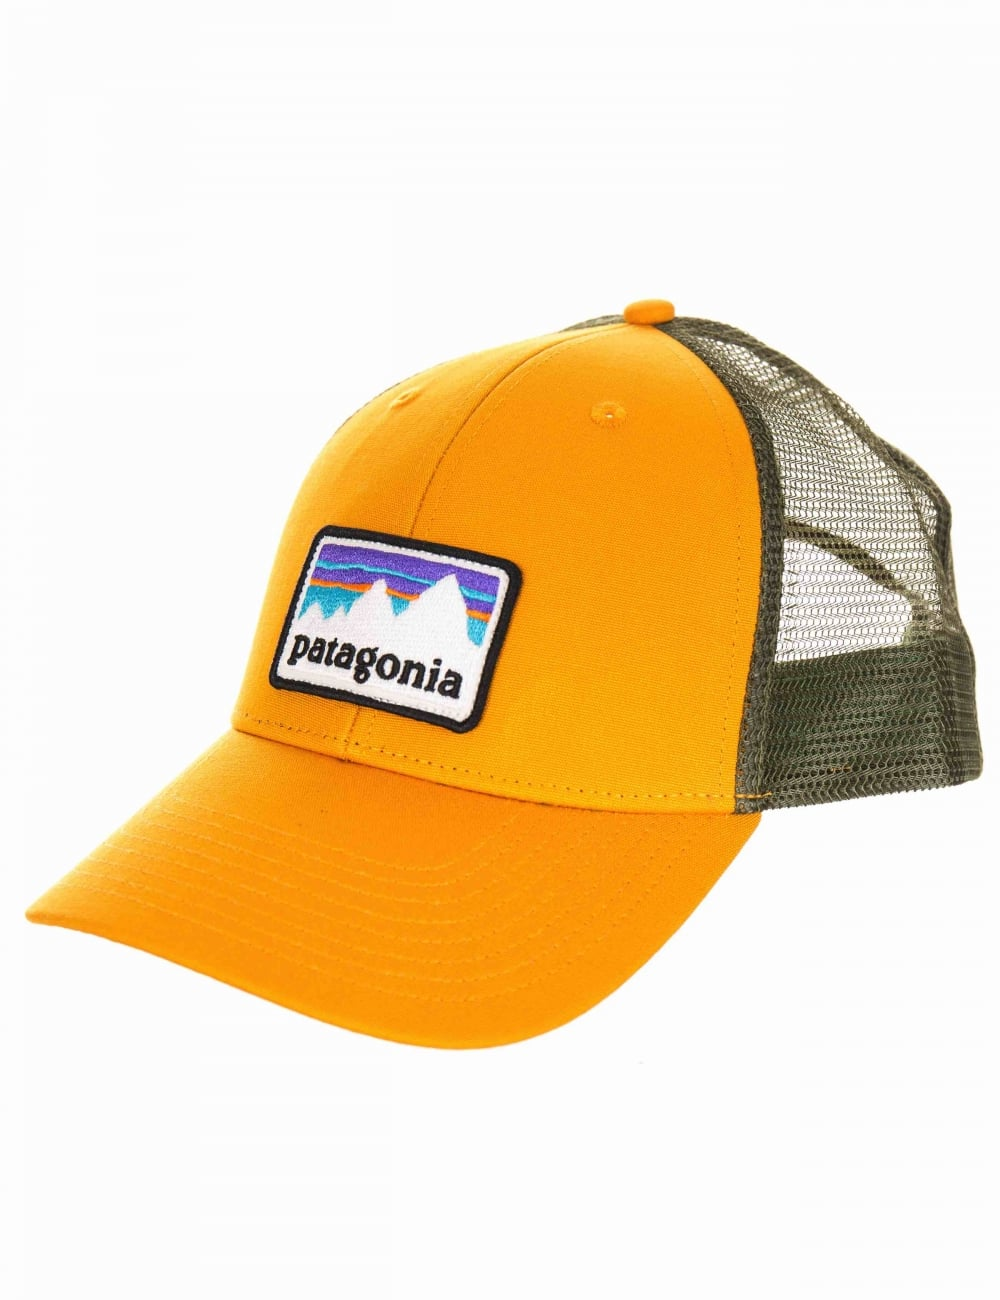 Patagonia Shop Sticker Trucker Hat - Ysidro Yellow - Hat Shop from ... cf75d6b74c4d